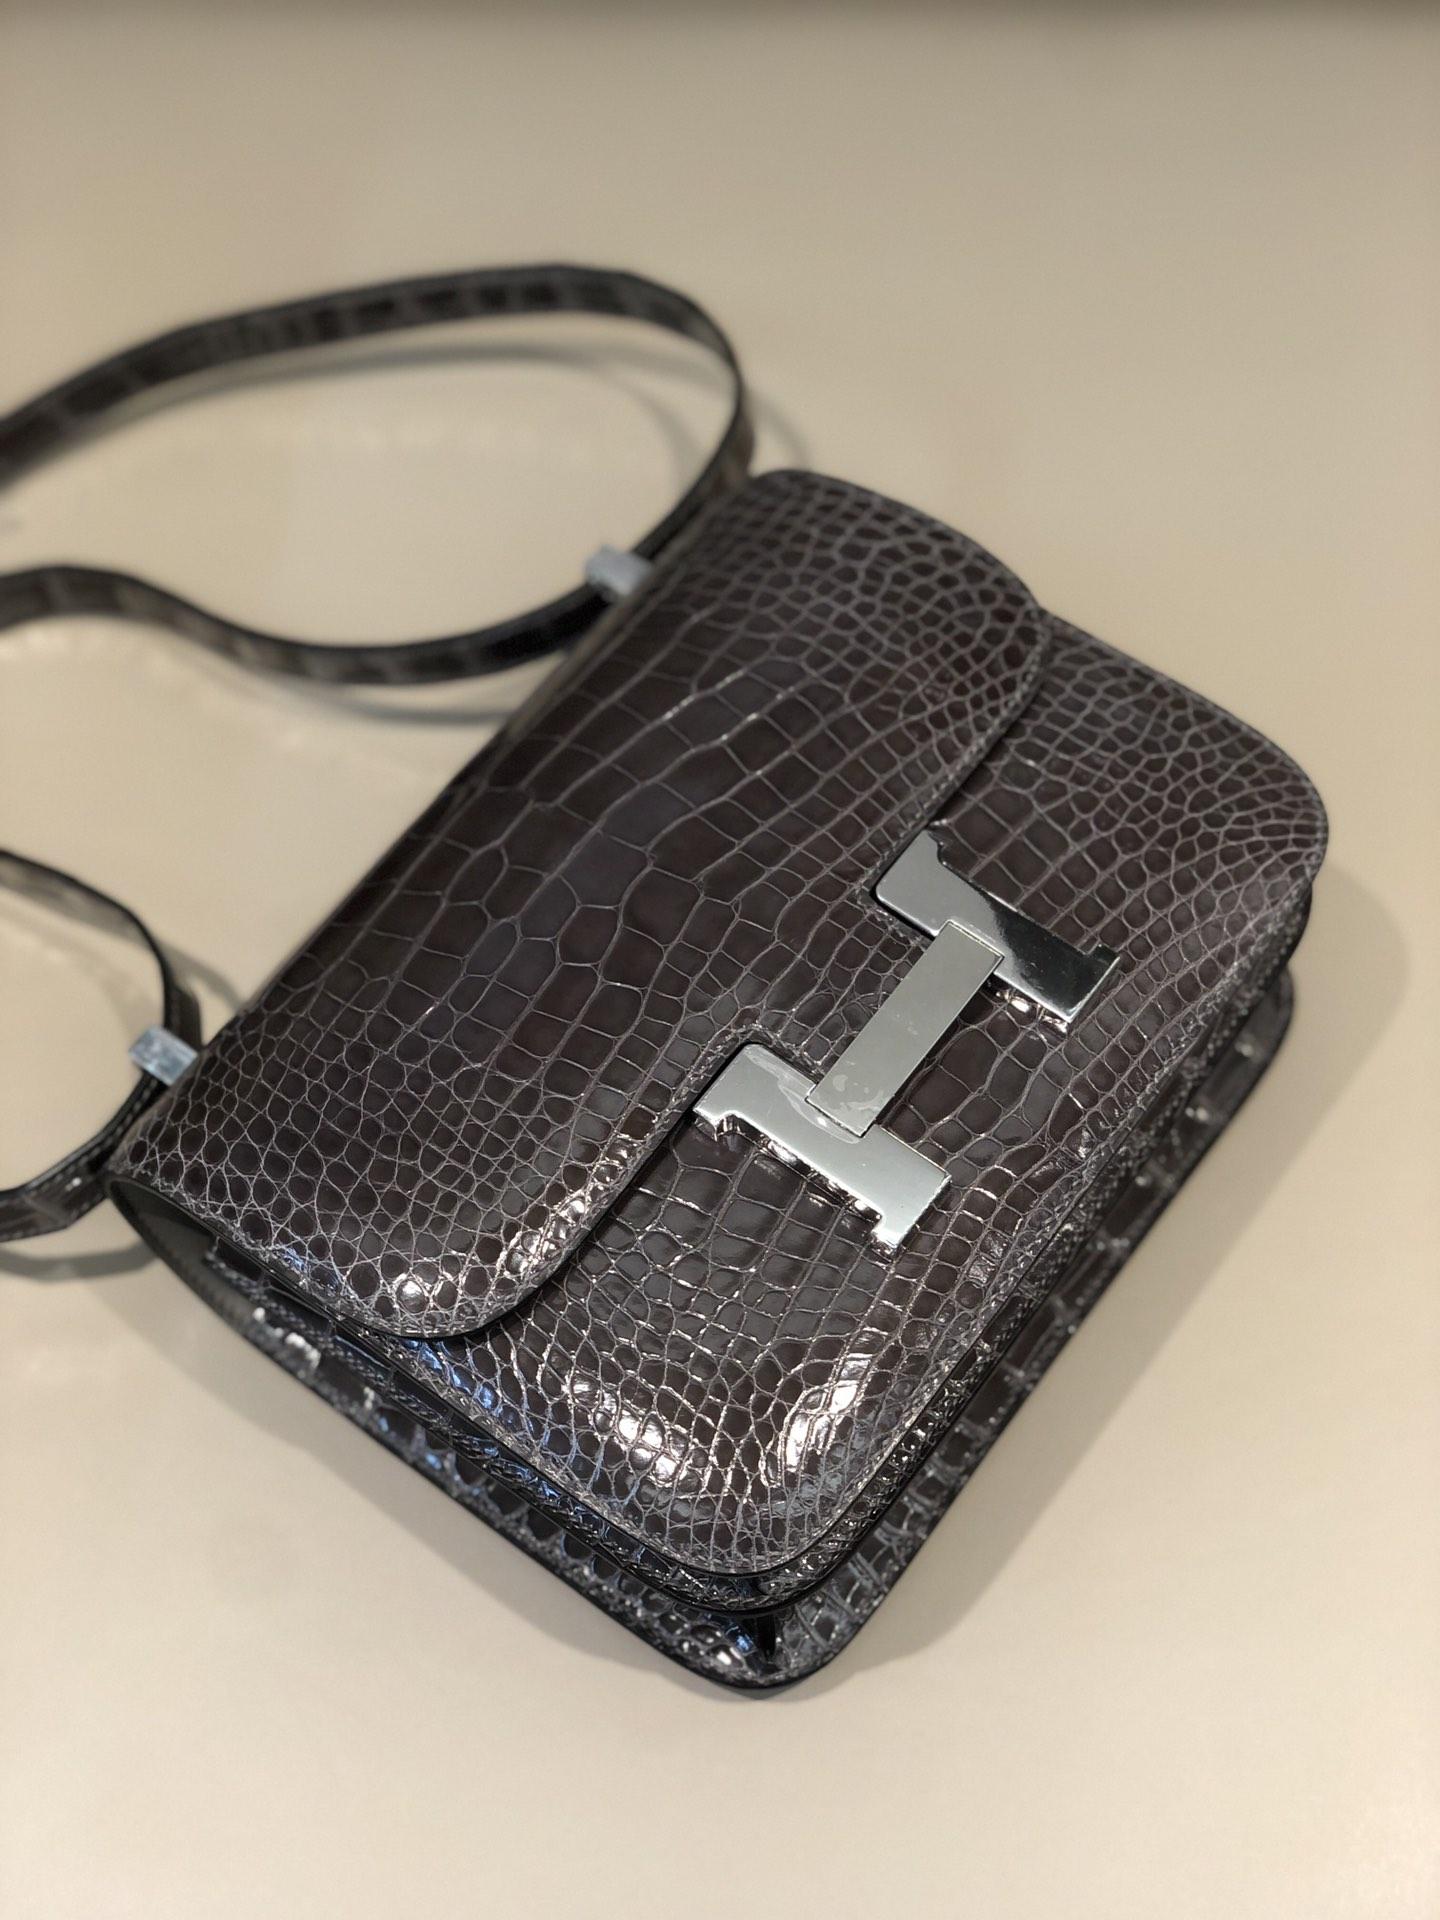 Stock Hermes Shiny Crocodile CK88 Gris Graphite Constance Bag24cm Silver Hardware